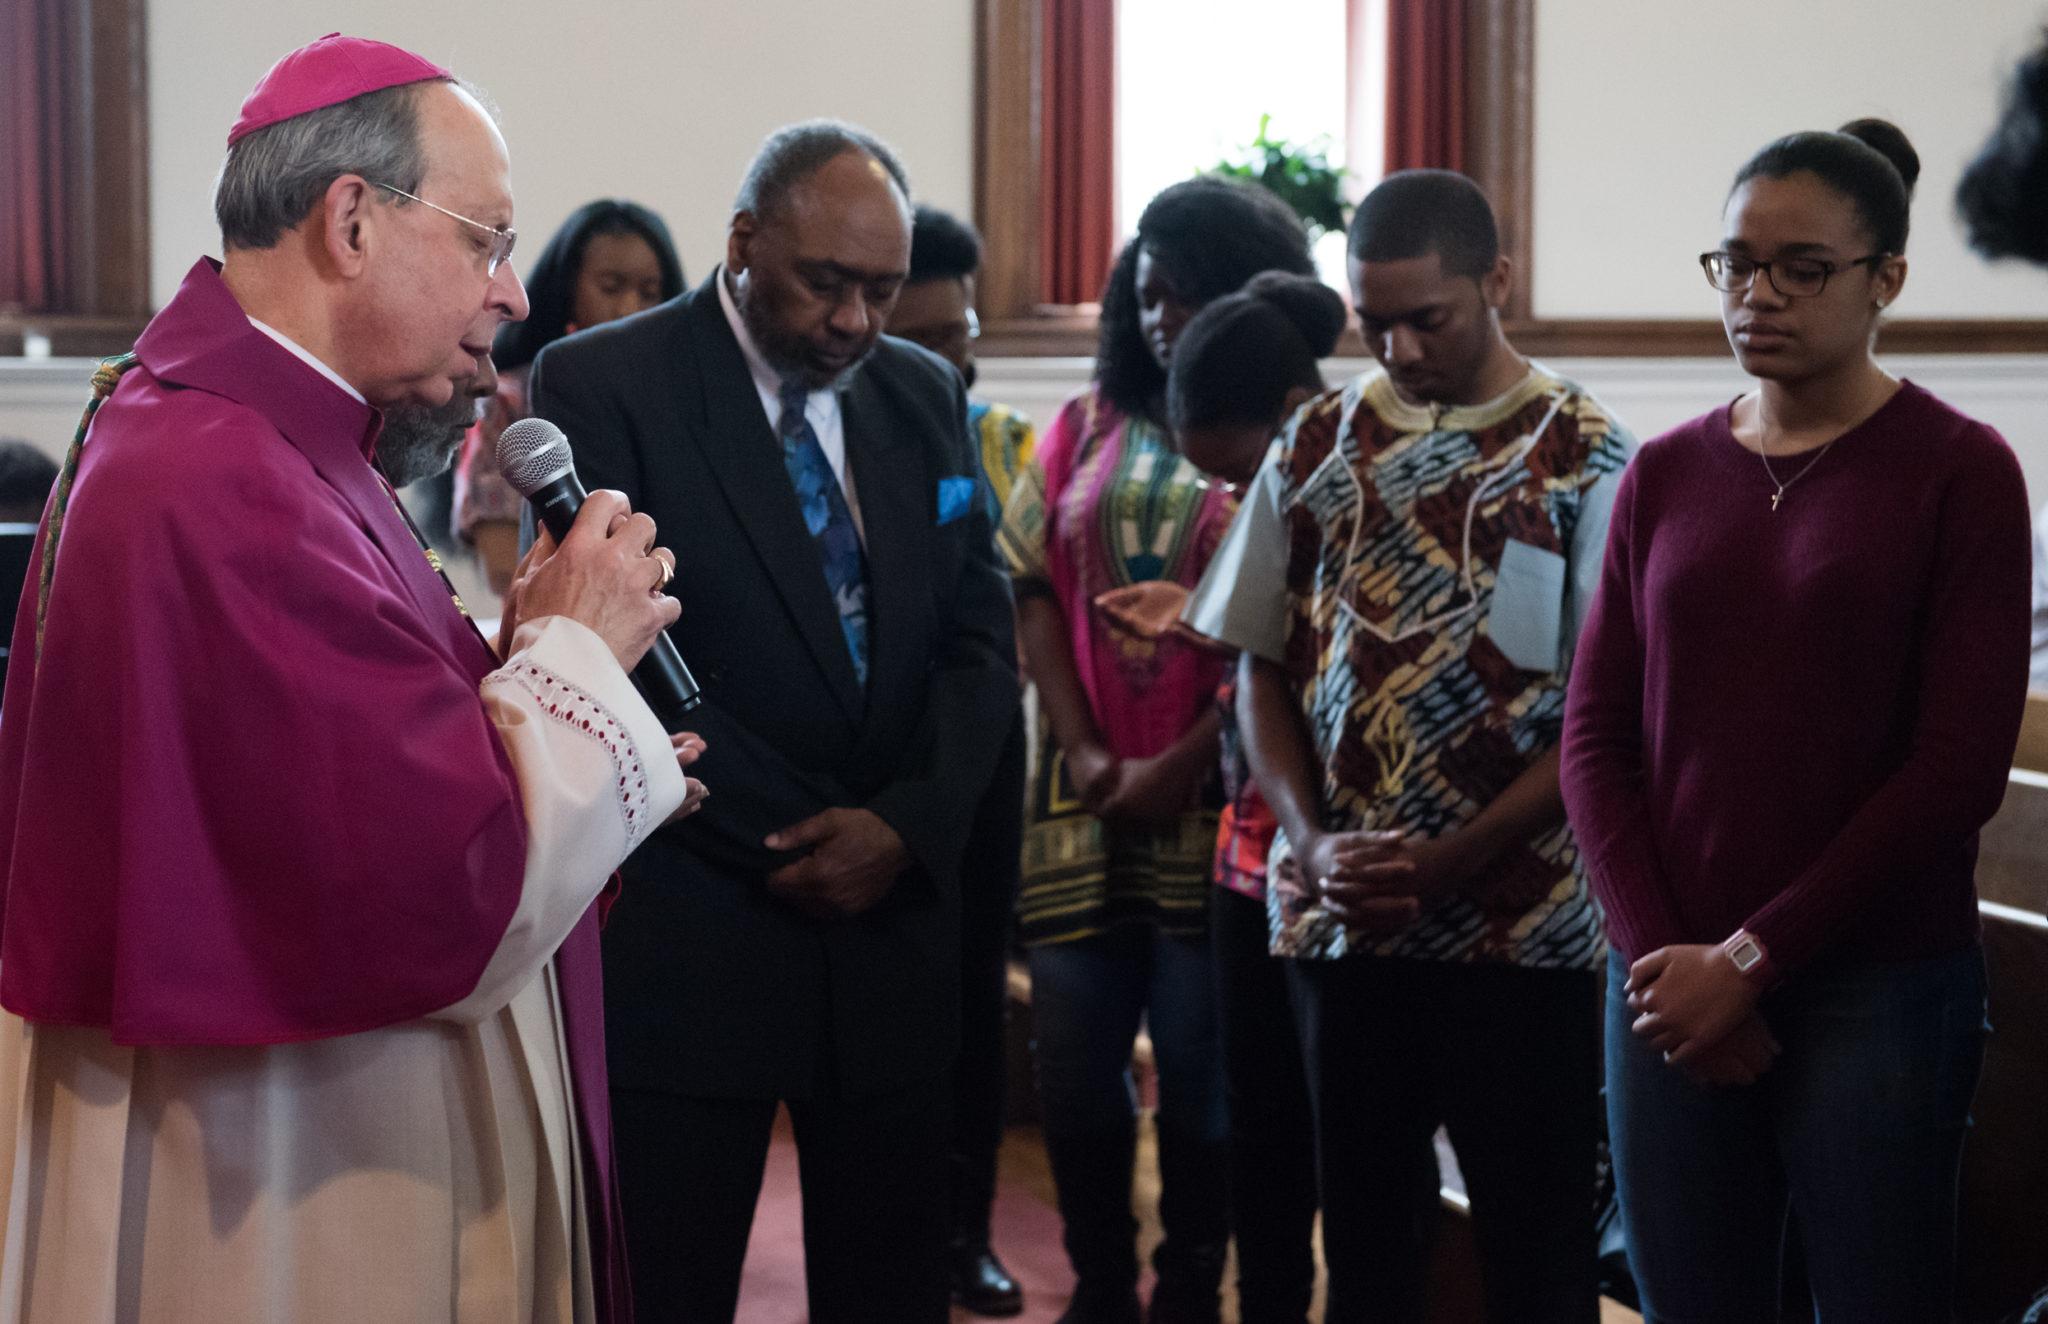 Archbishop Lori Community Prayer - The Catholic Community Foundation